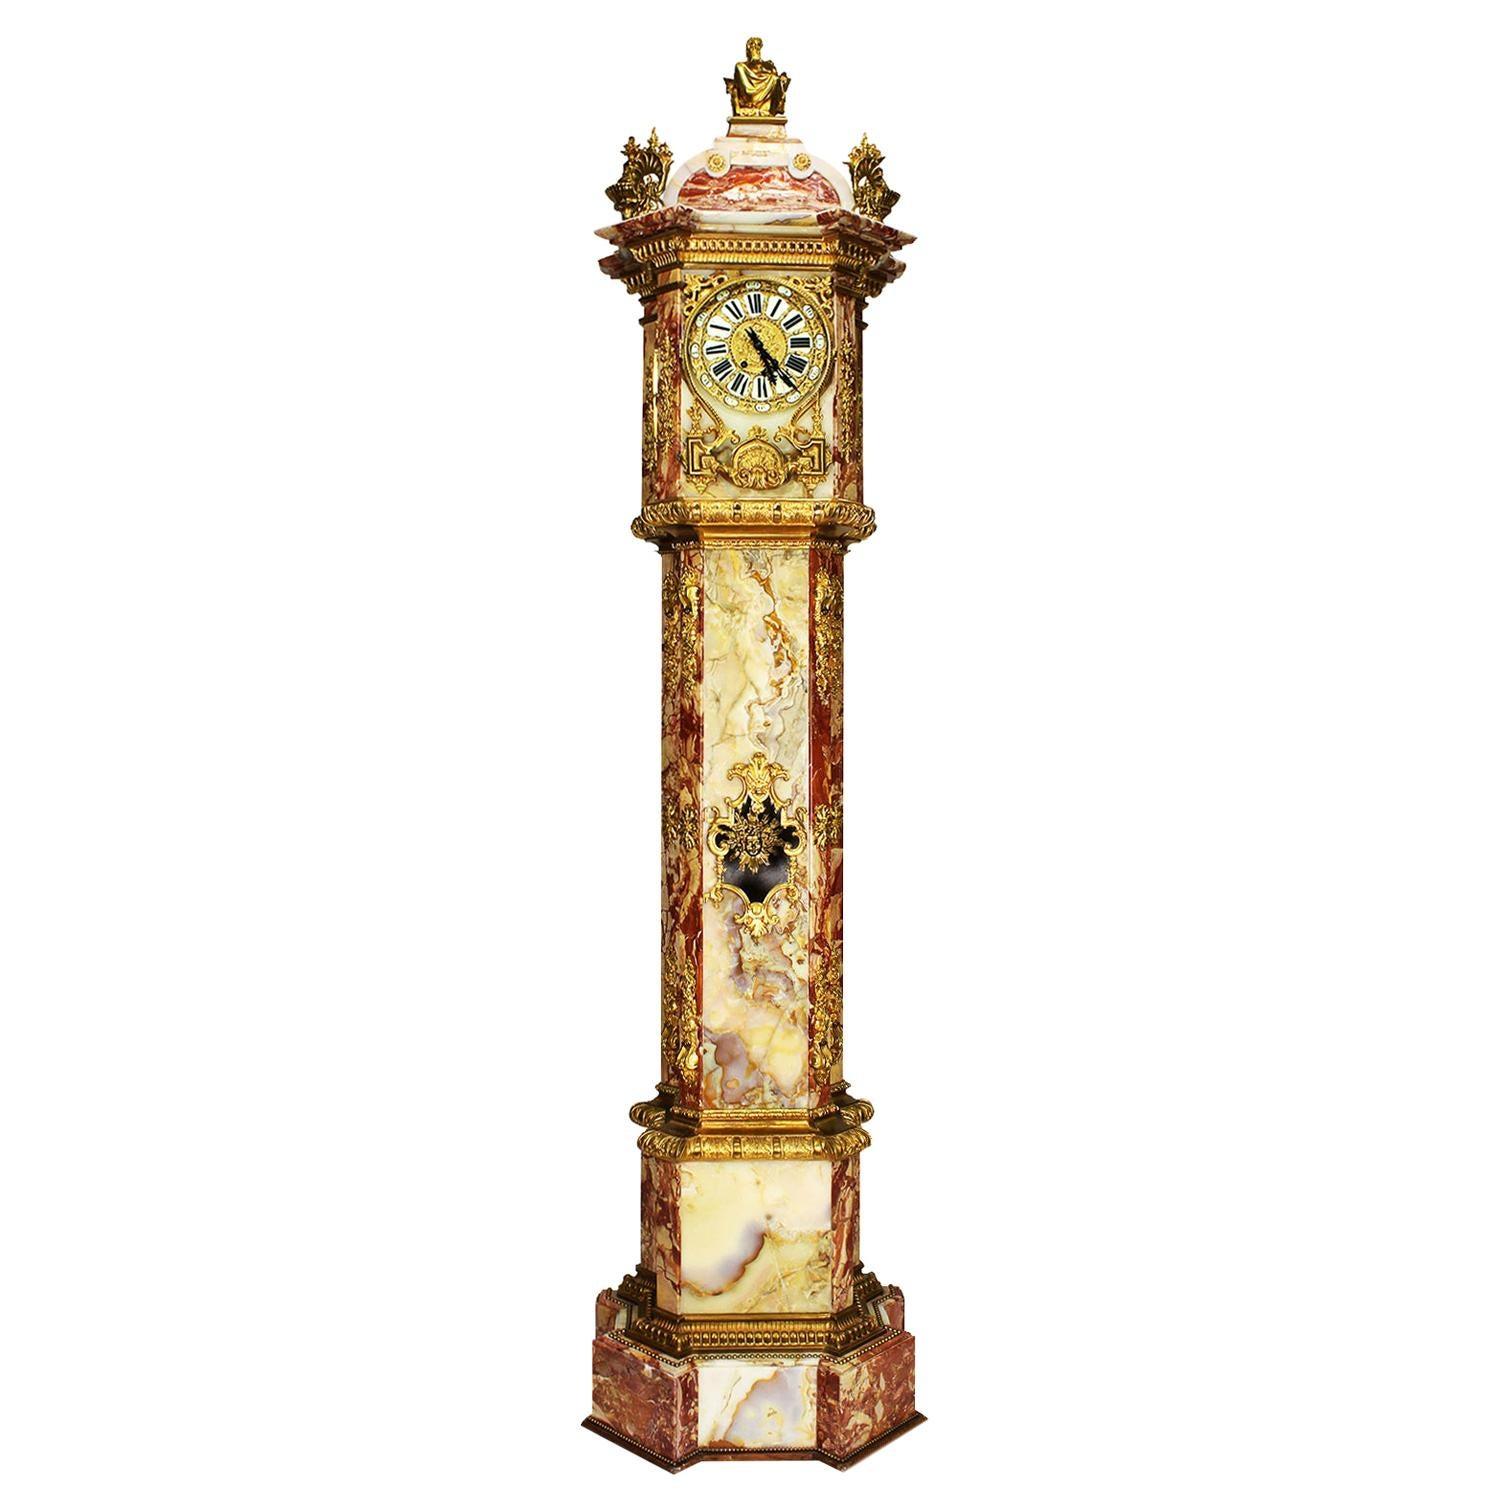 Monumental 19th Century Ormolu Mounted Onyx & Marble Longcase Grandfather Clock